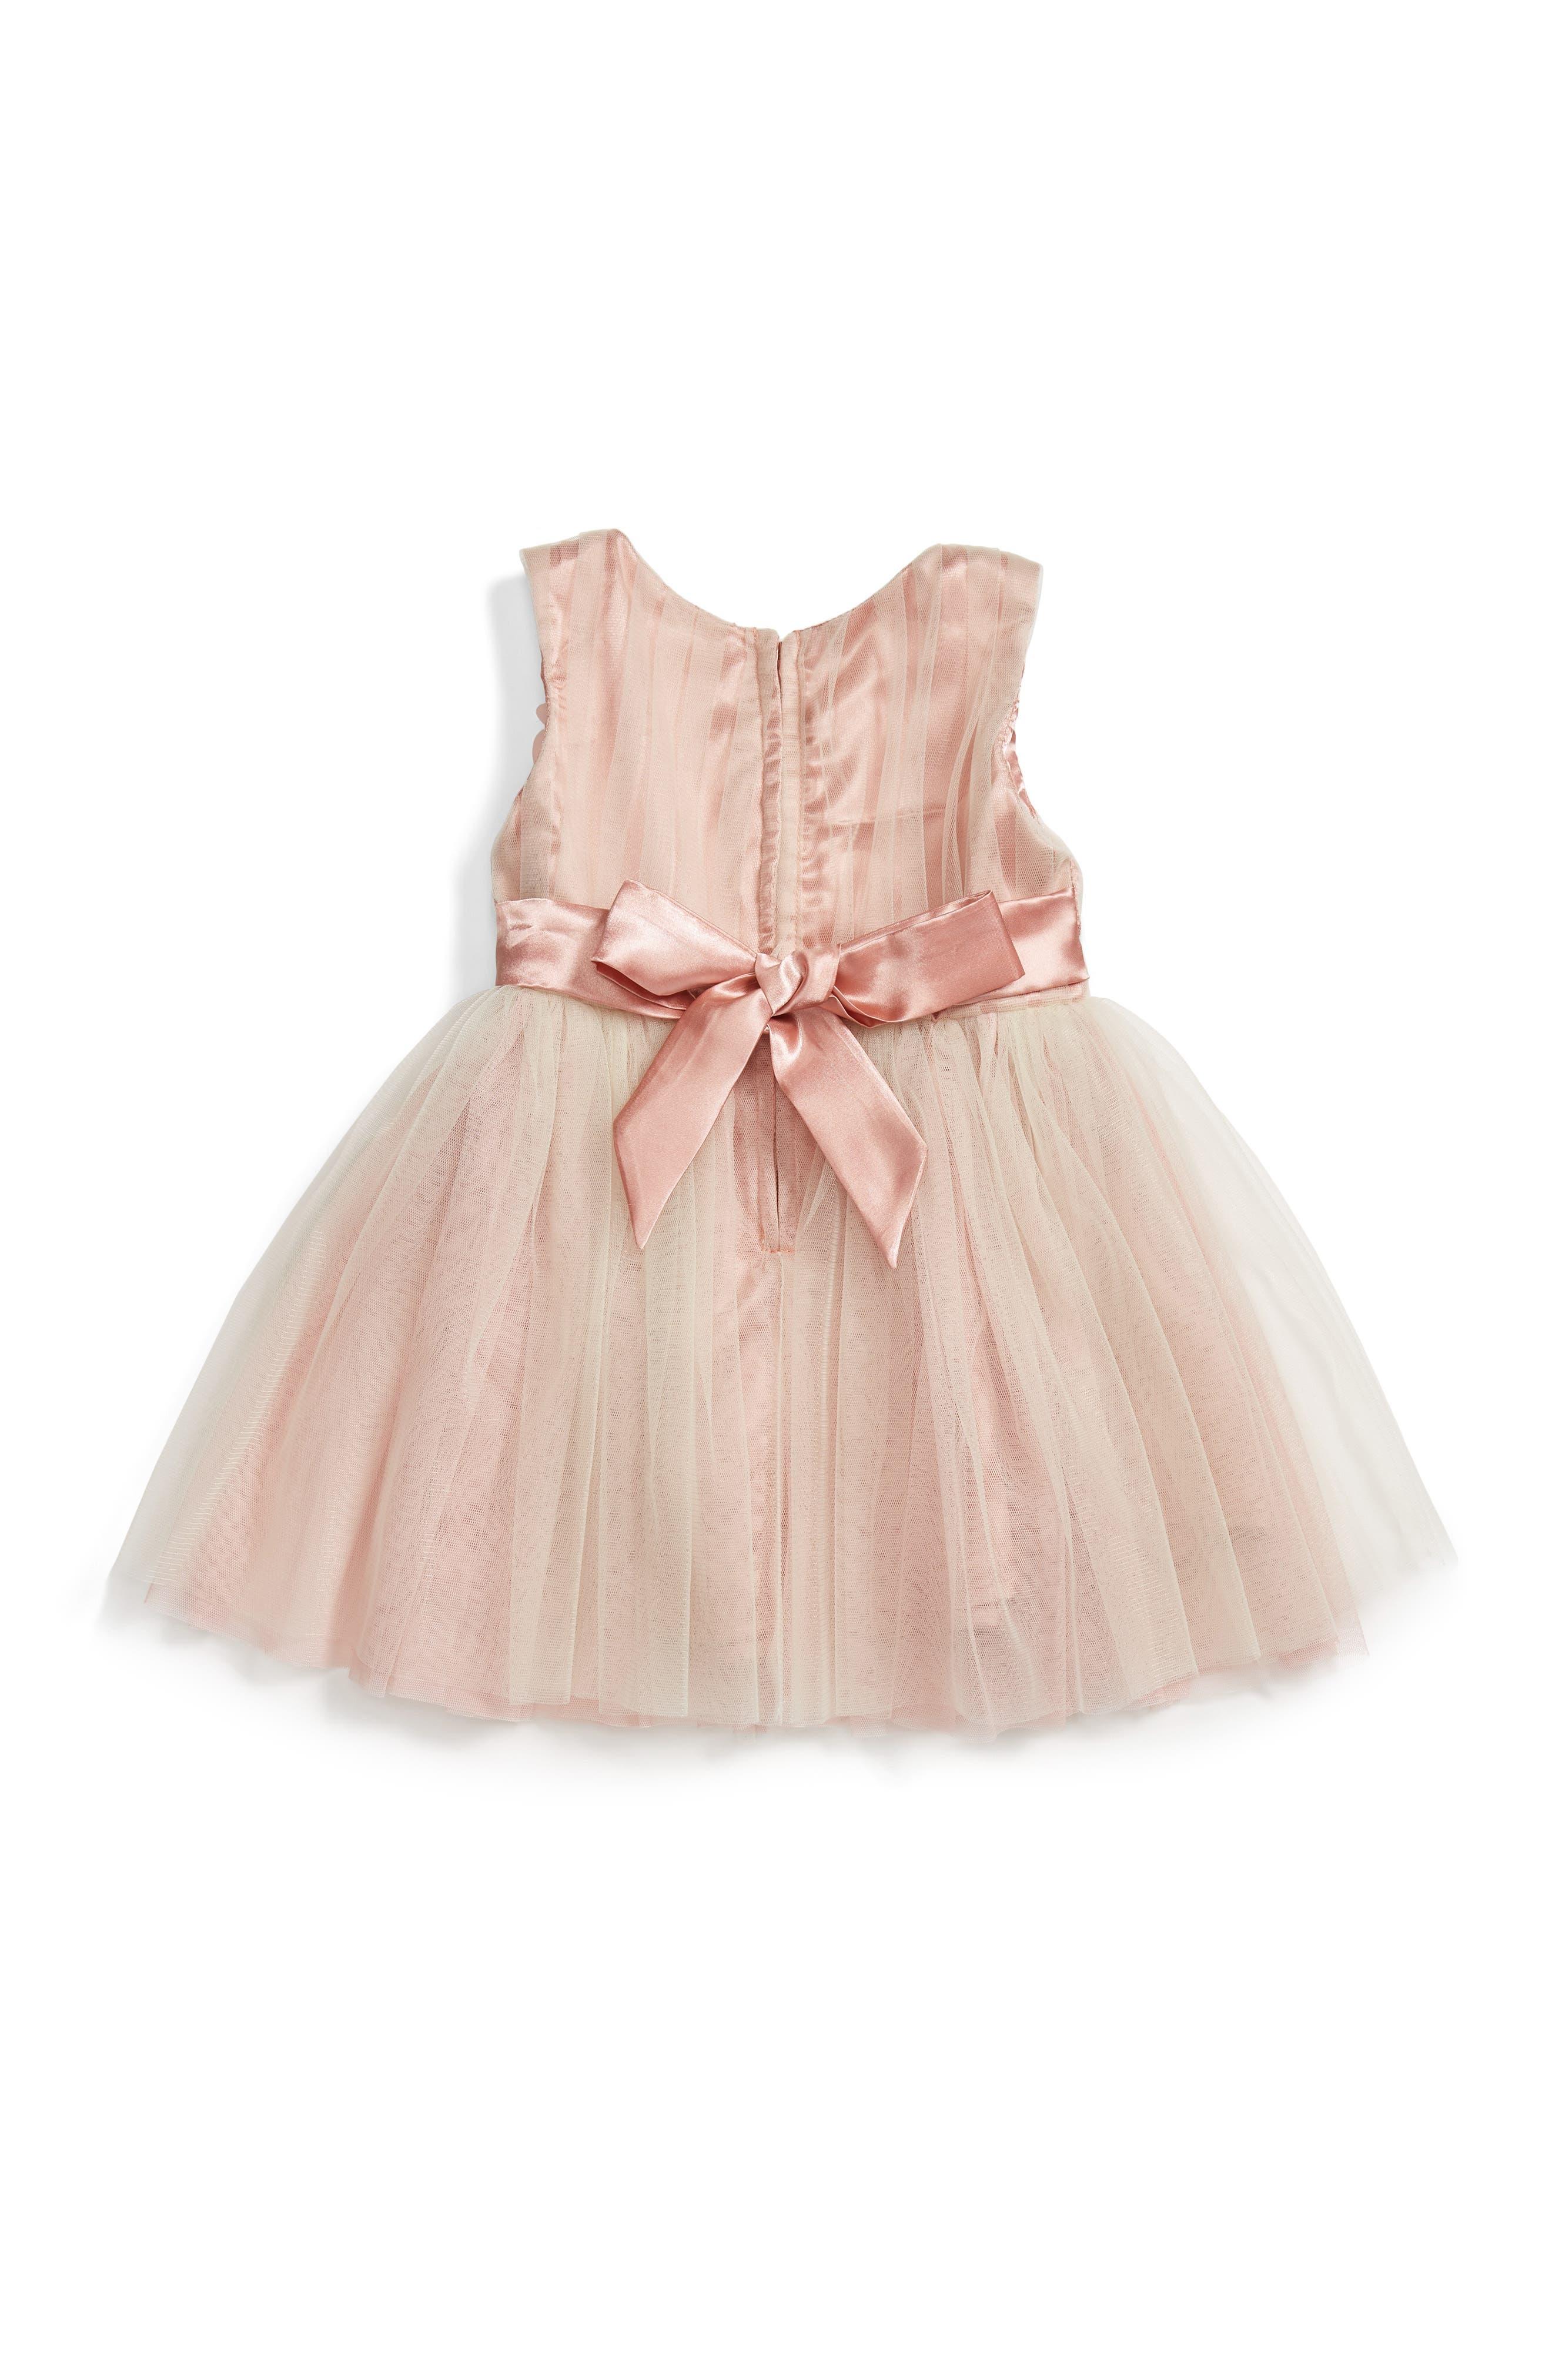 POPATU, Sleeveless Rosette Tulle Dress, Alternate thumbnail 2, color, TAUPE